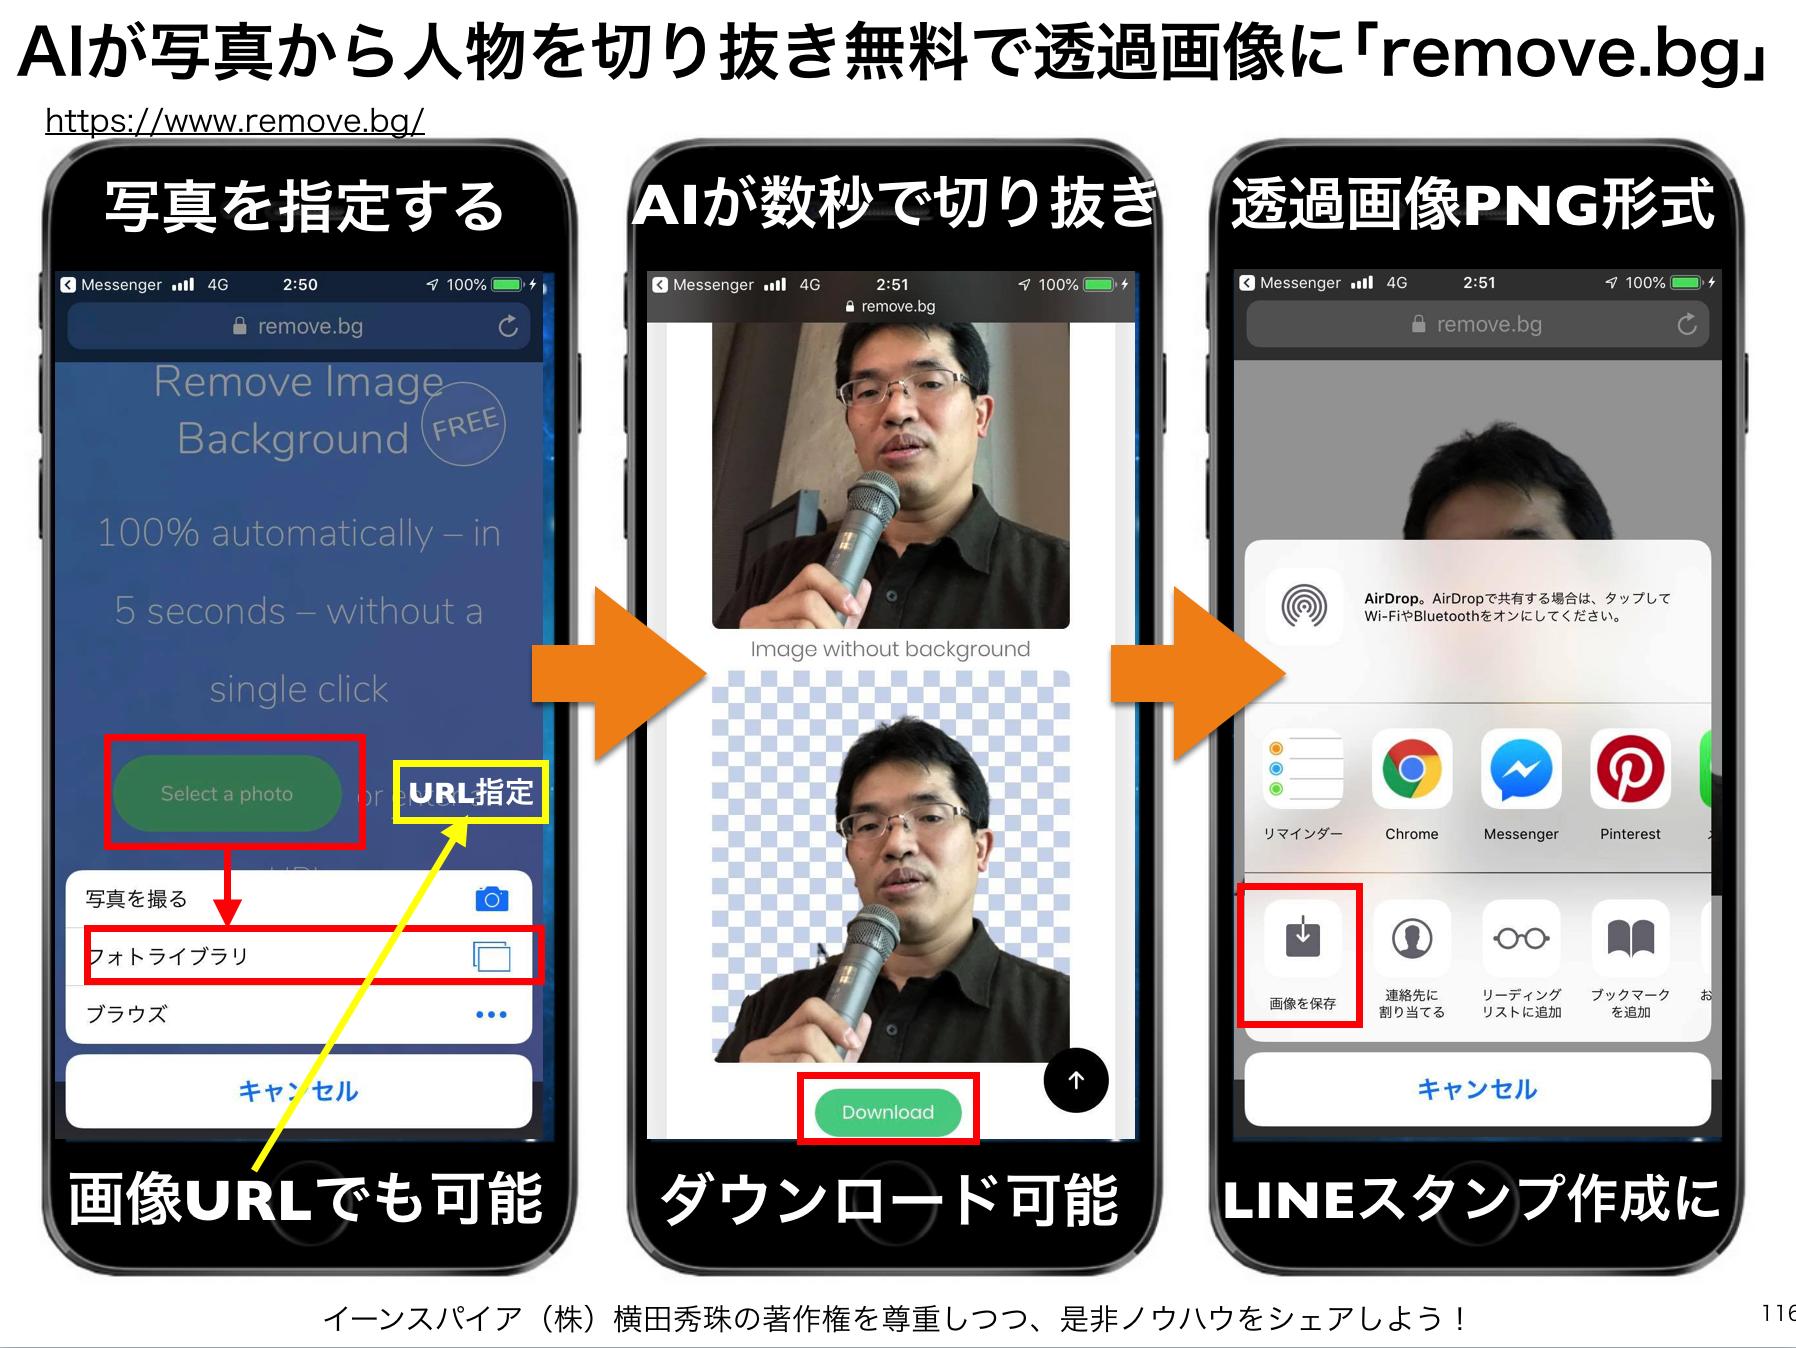 AIが写真から人物を切り抜き無料で透過画像に「remove.bg」